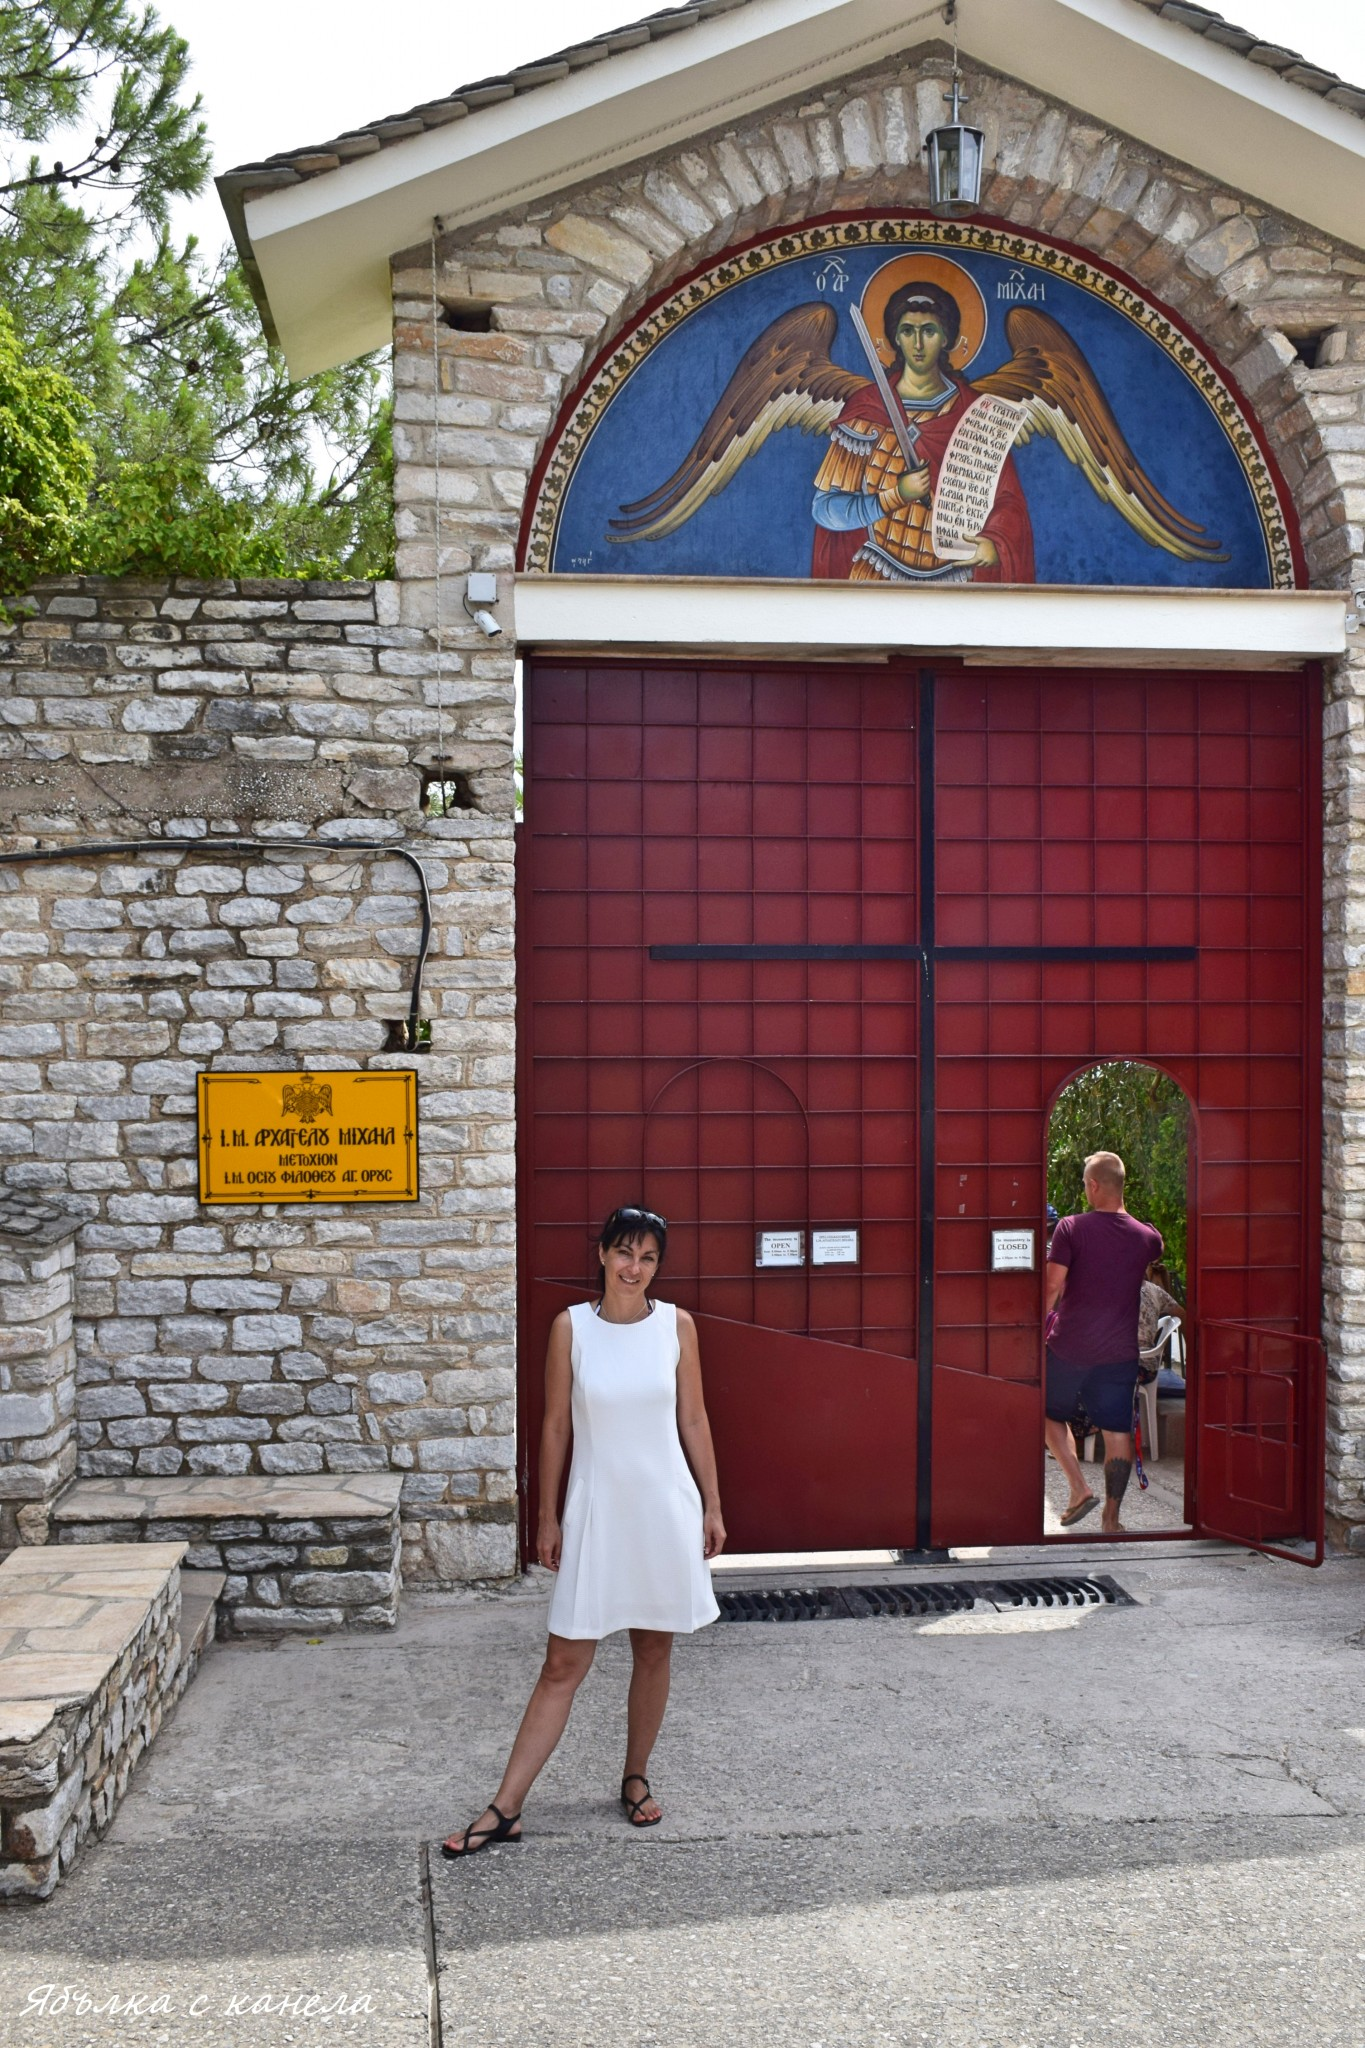 monastery-arh2